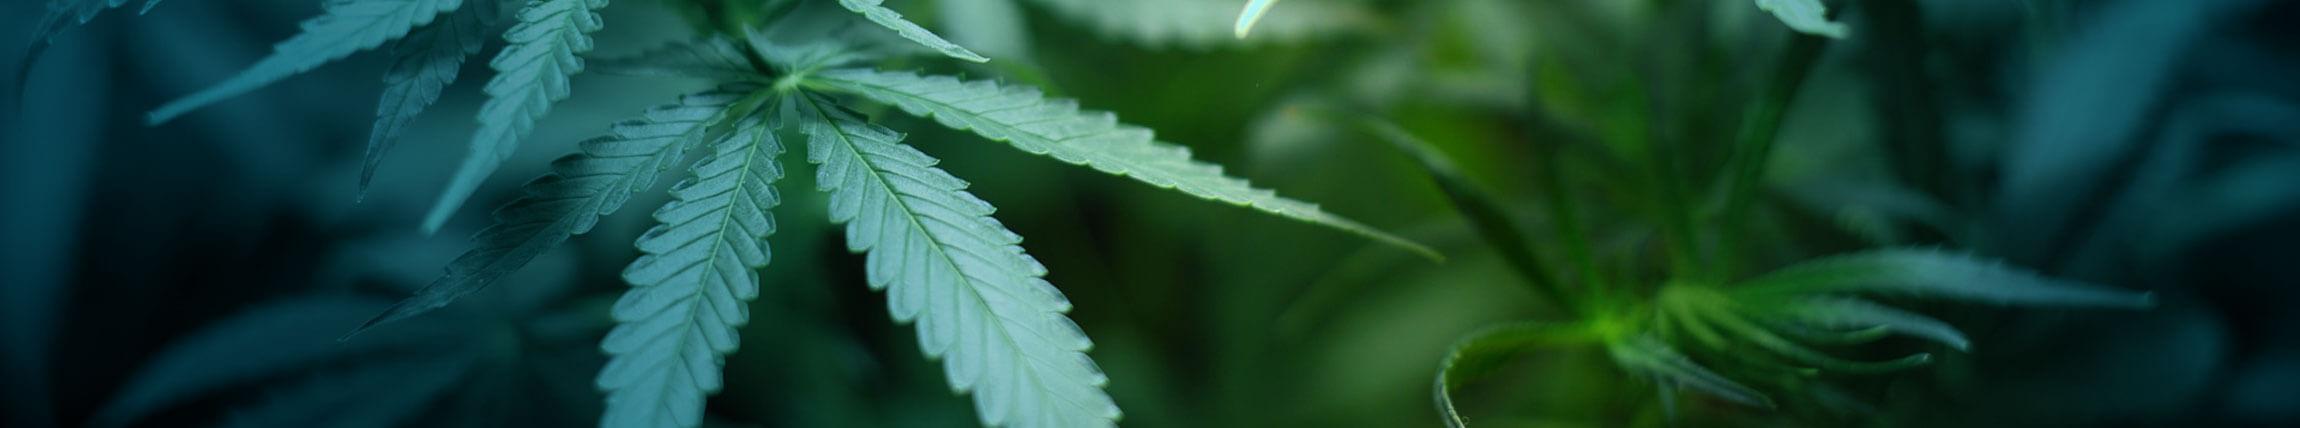 Fernley marijuana dispensary hosting grand opening Wednesday